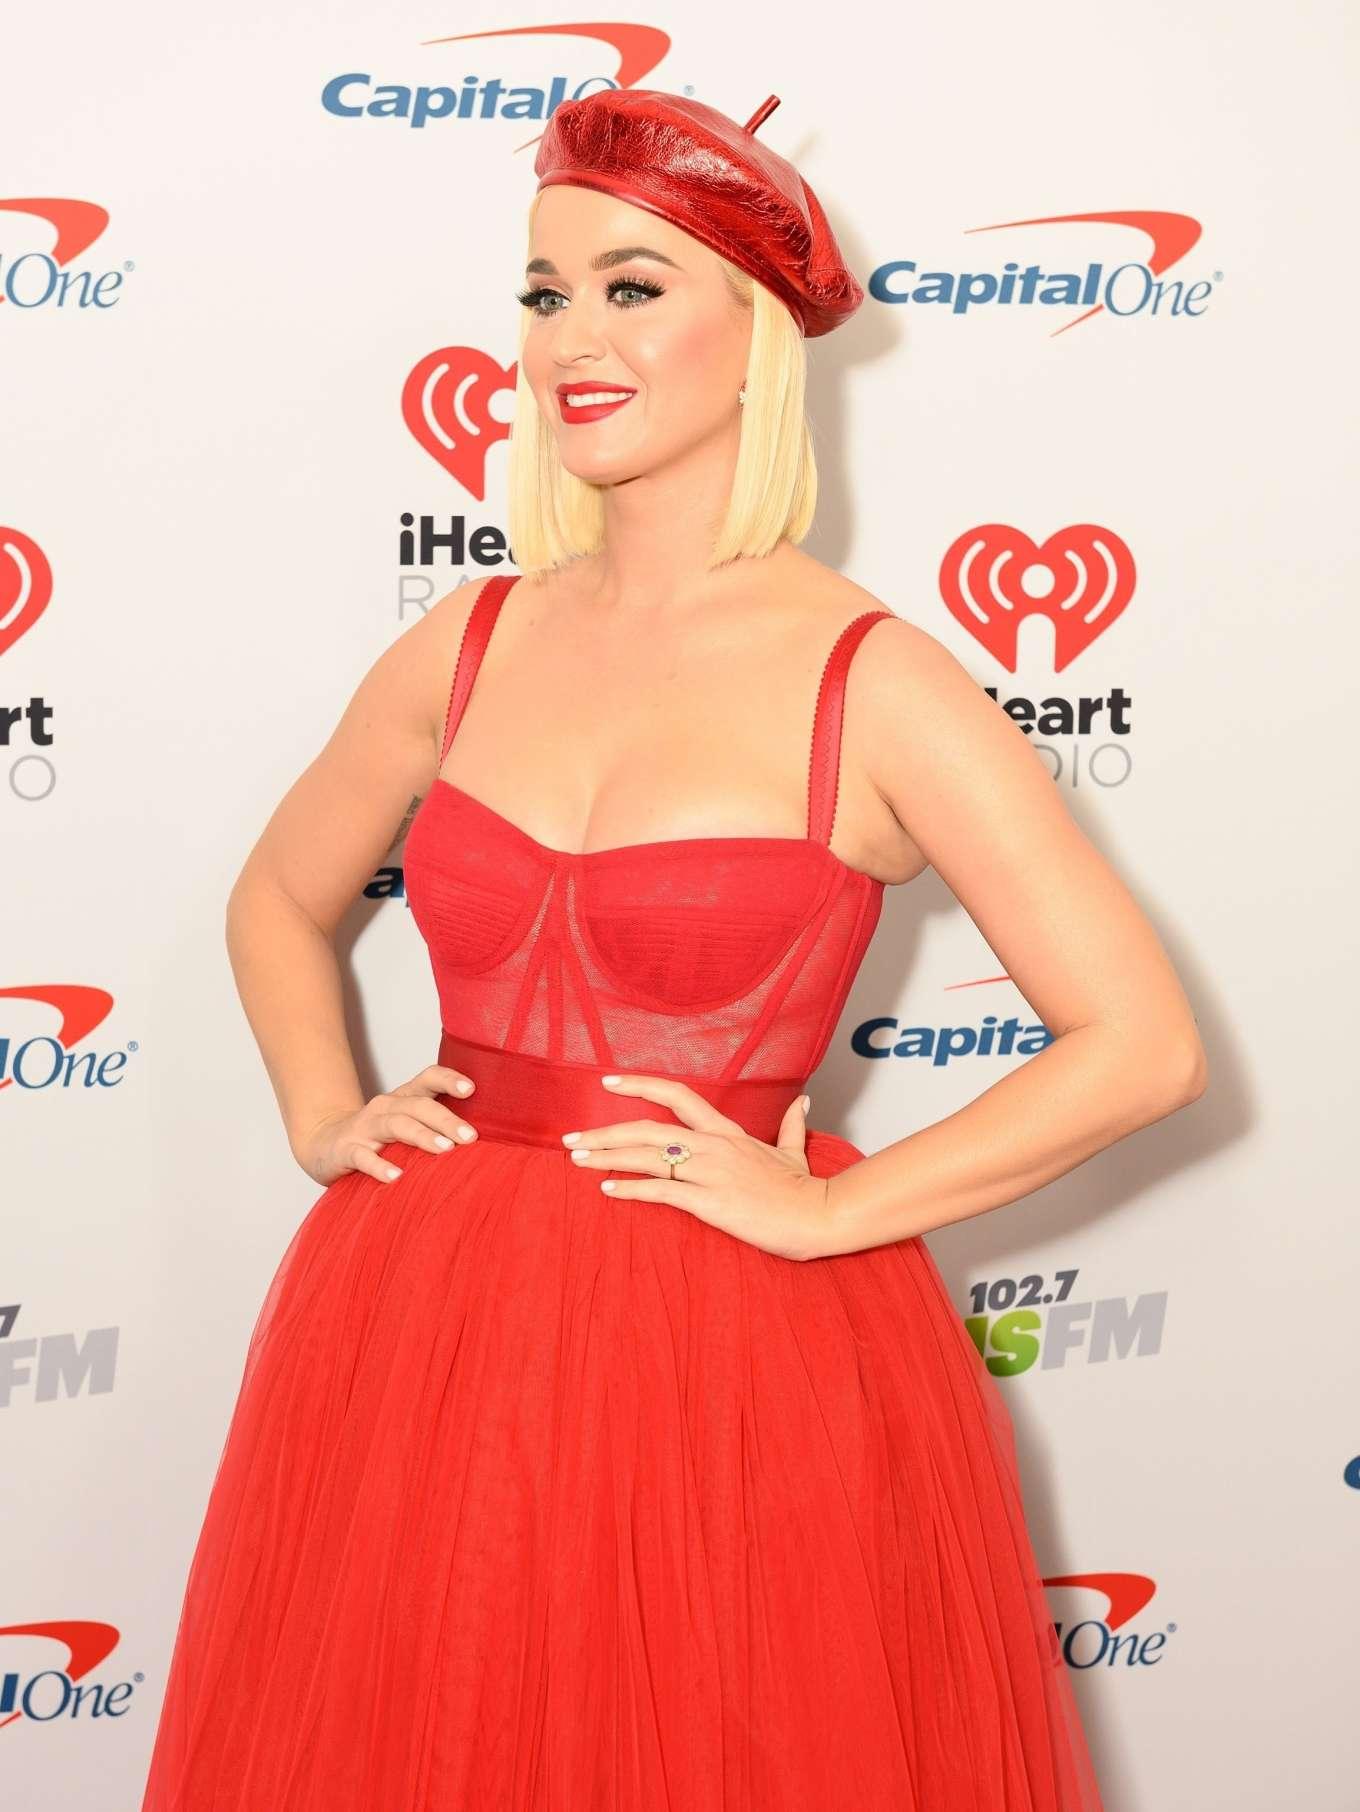 Katy Perry 2019 : Katy Perry – 2019 KIIS FMs iHeartRadio Jingle Ball-19